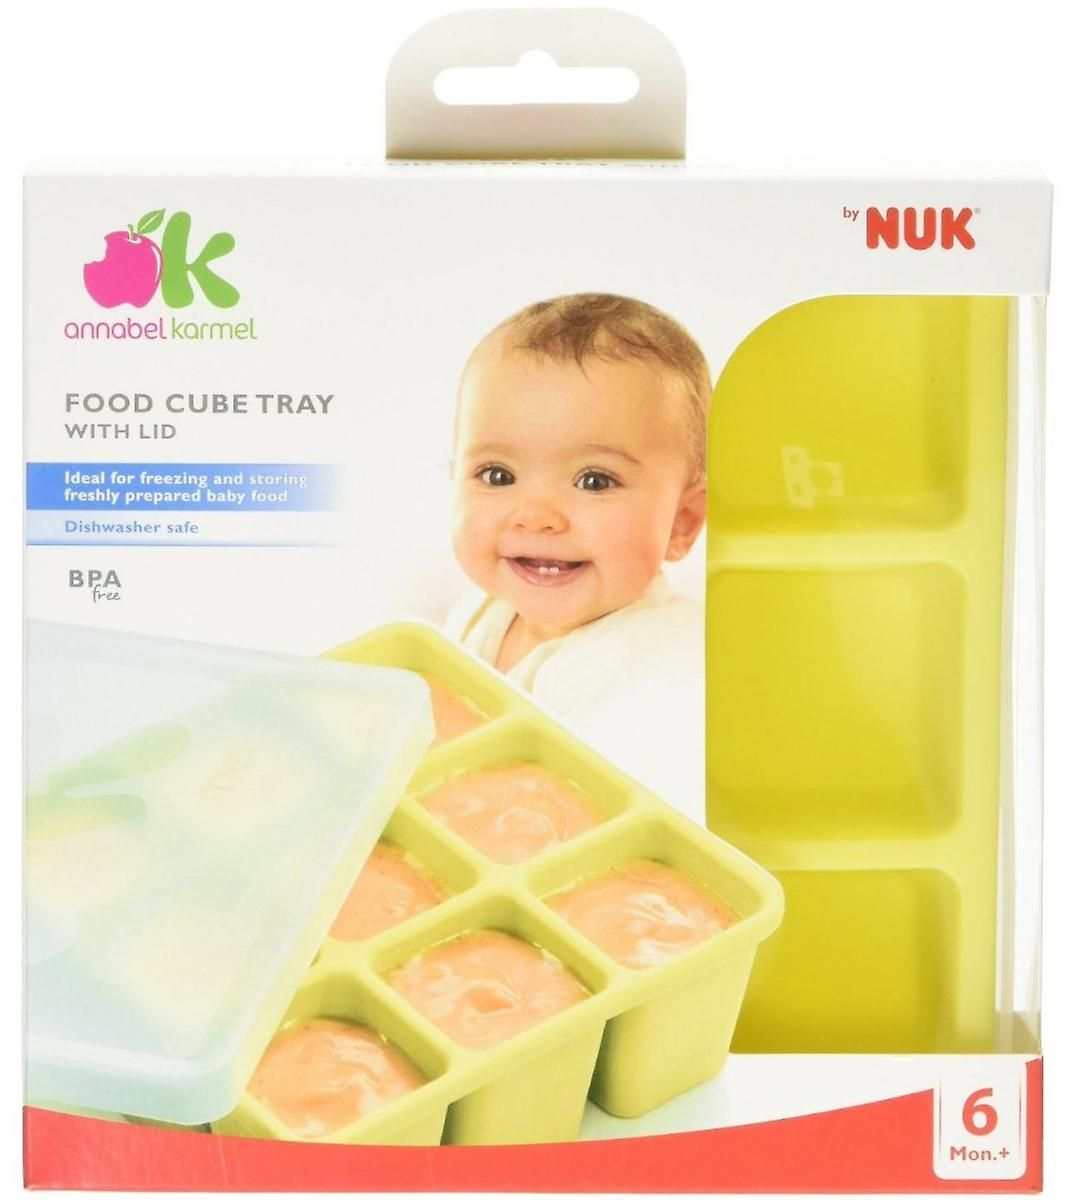 Annabel Karmel By Nuk Food Cube Trays 3x3 Baby Food Storage